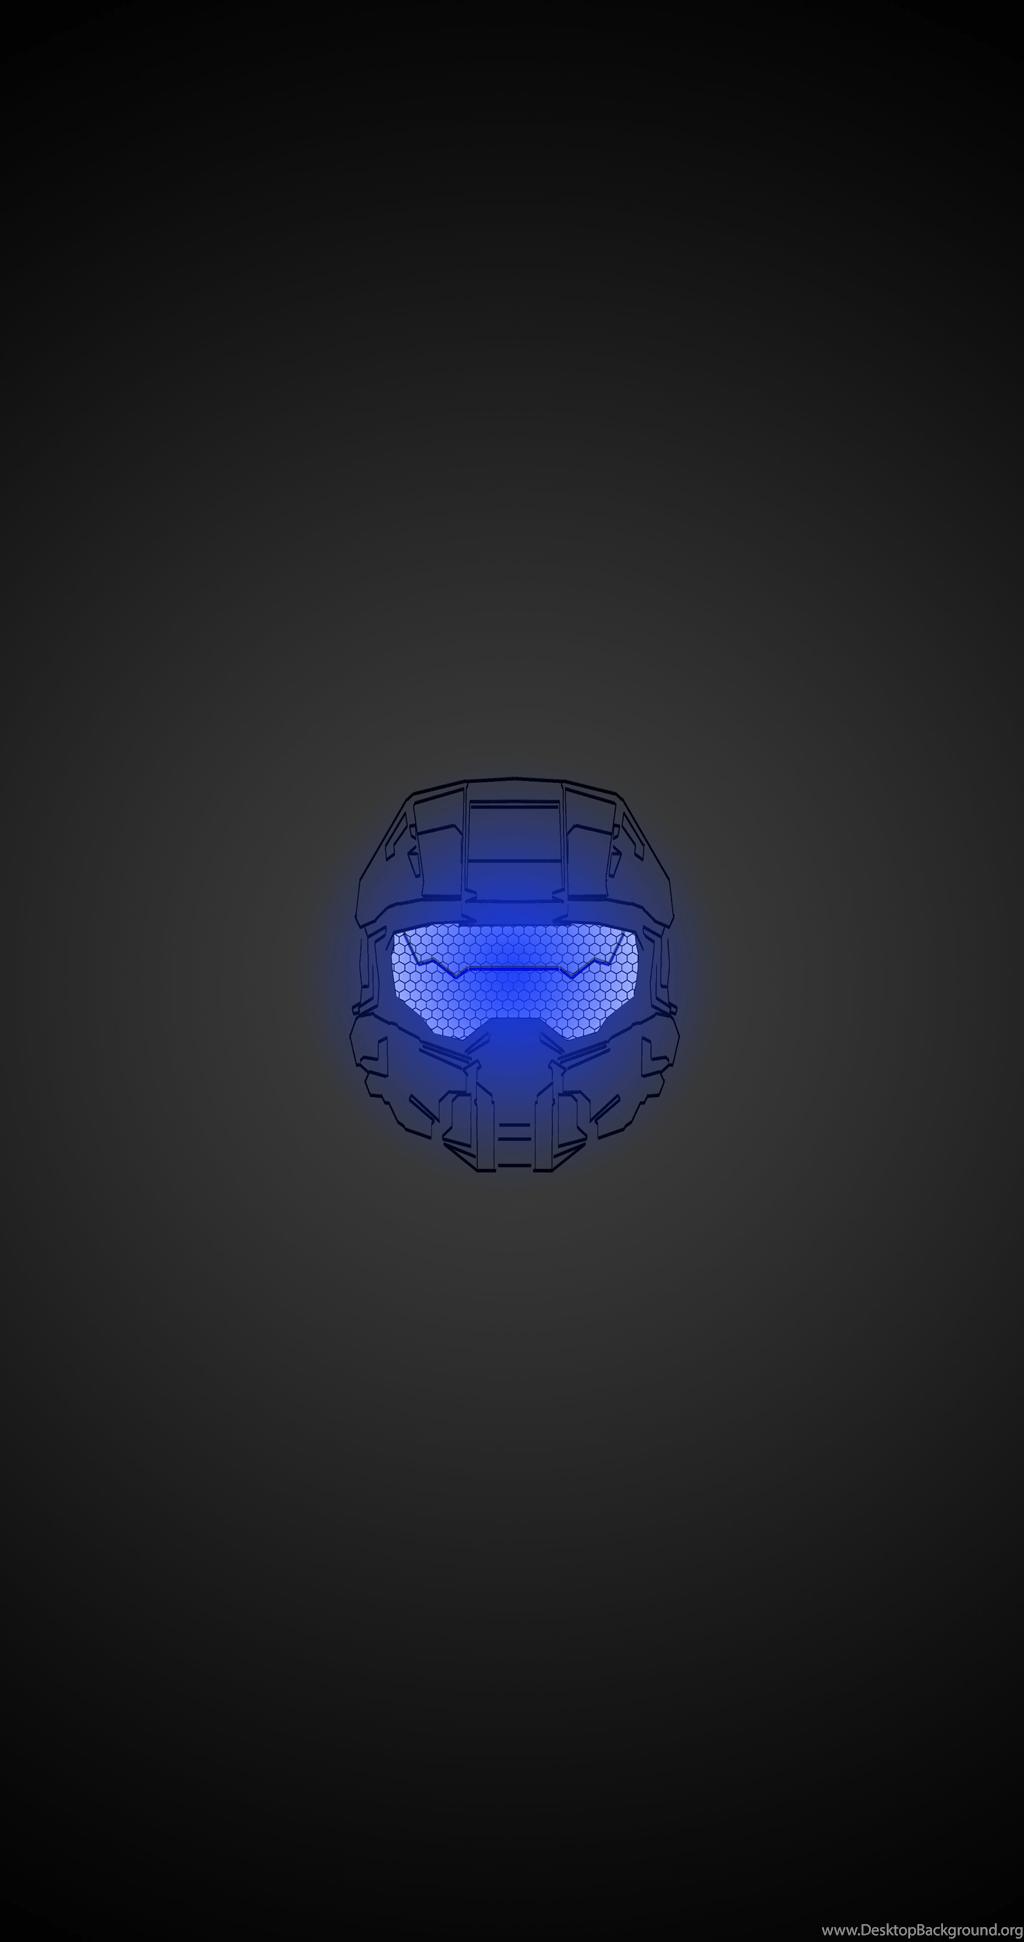 Halo 5 Wallpapers HD 4K Phone 1 Desktop Background